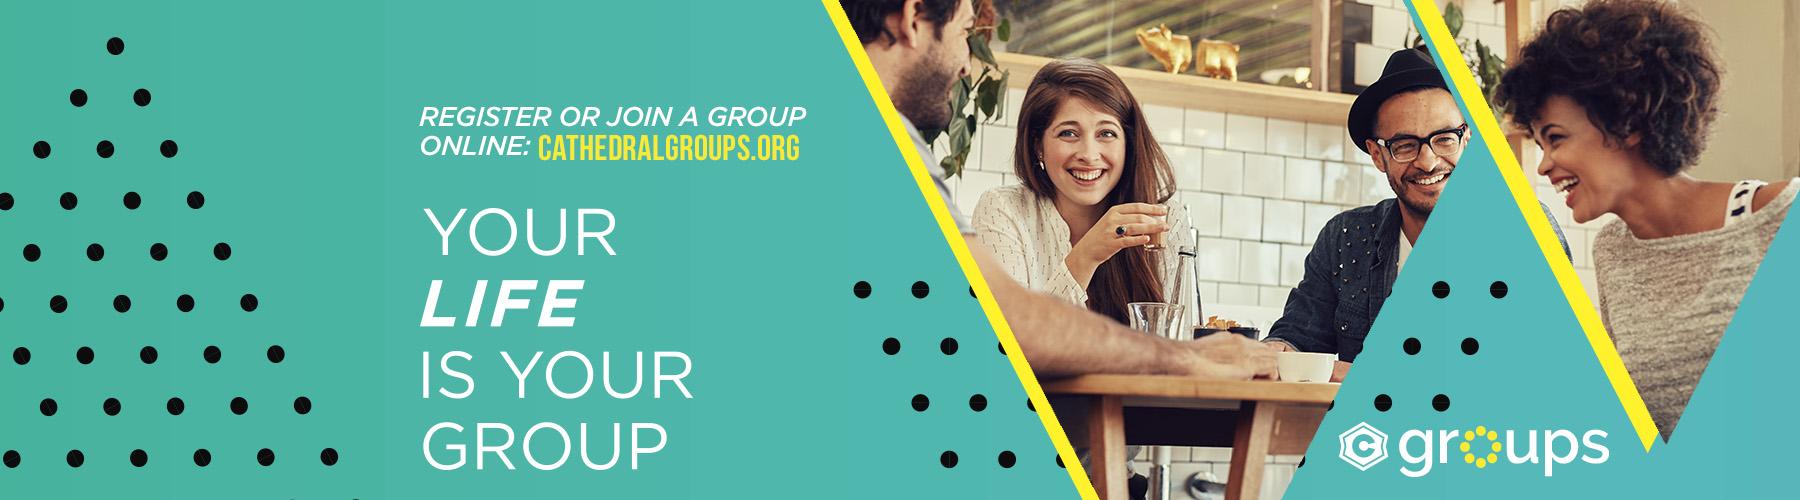 2017 Fall Small Groups Header